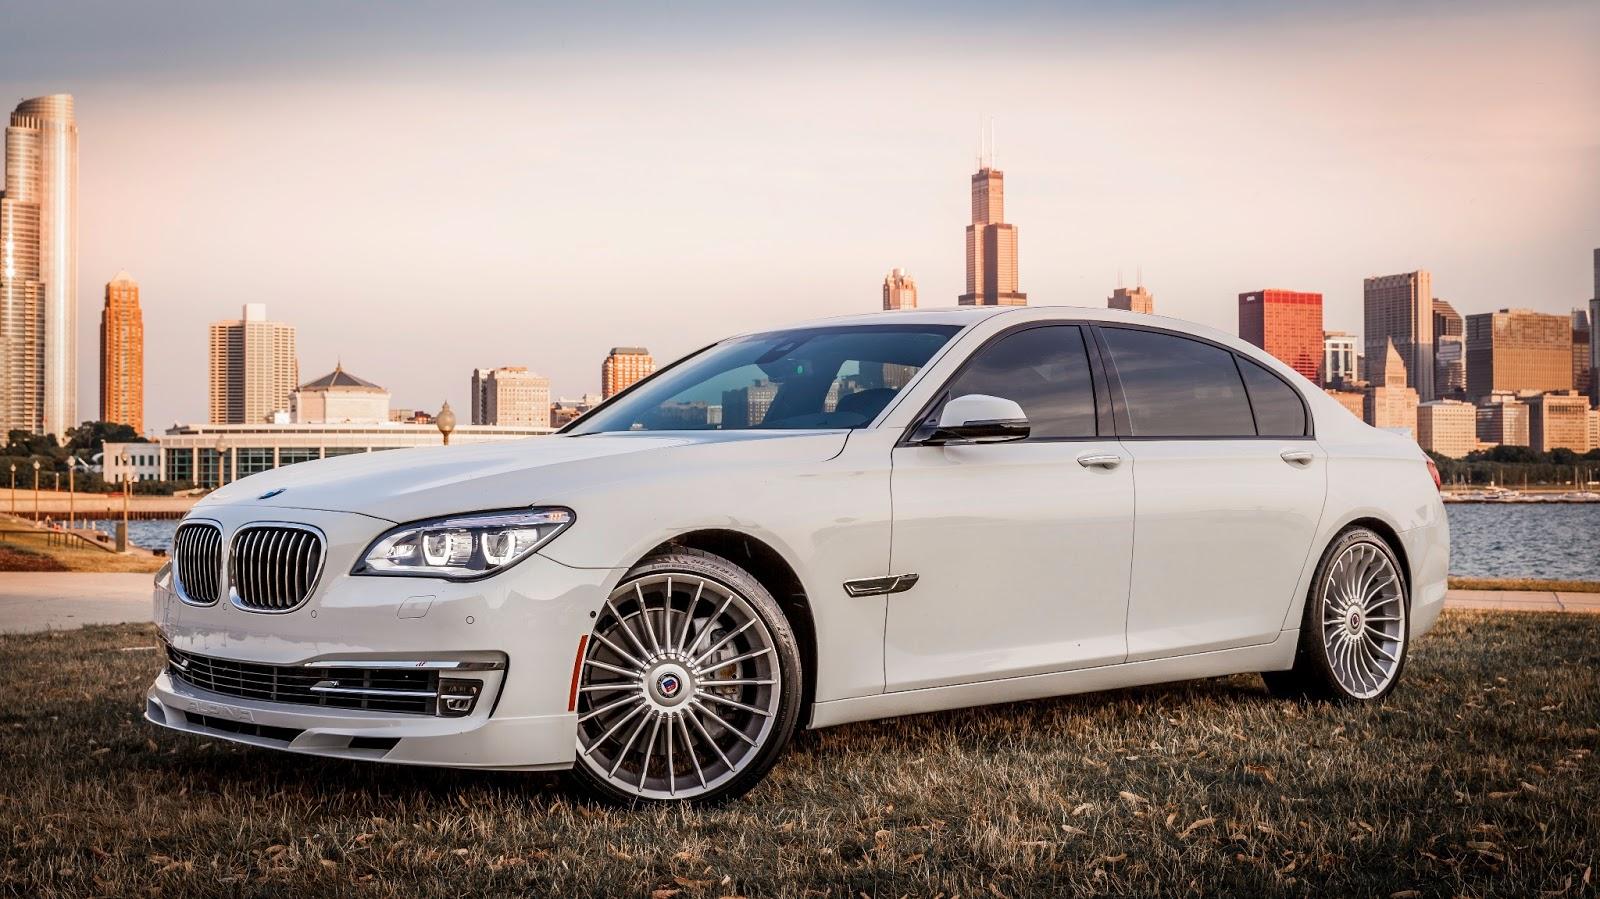 2014 BMW ALPINA B7 | Jaybe's Blog